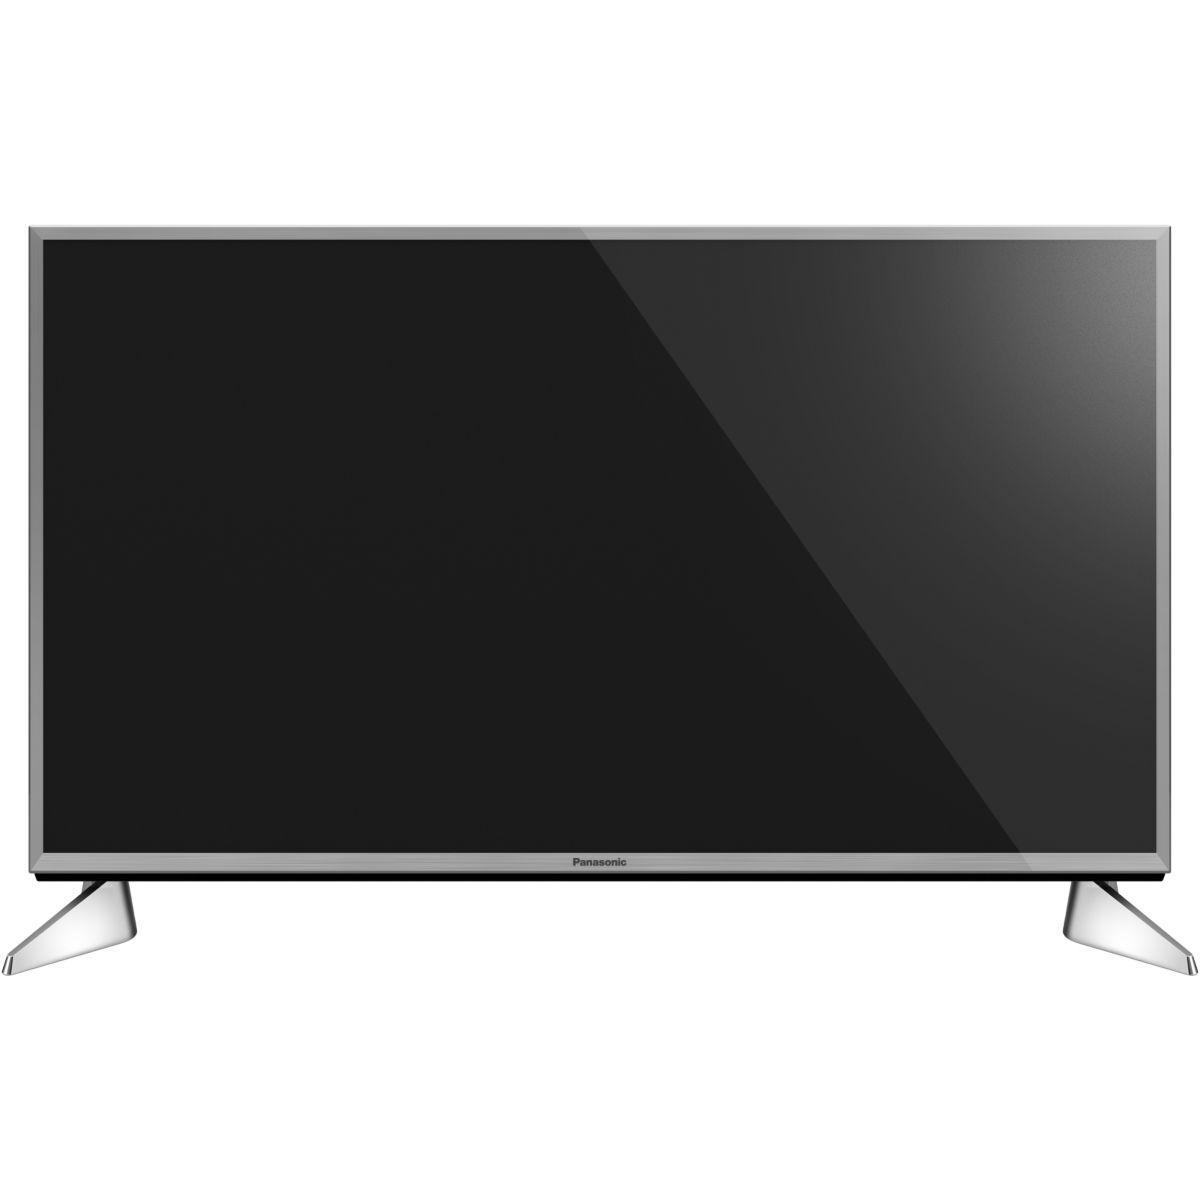 Tv panasonic tx-40ex610 1500 bmr 4k hdr - livraison offerte : code liv (photo)